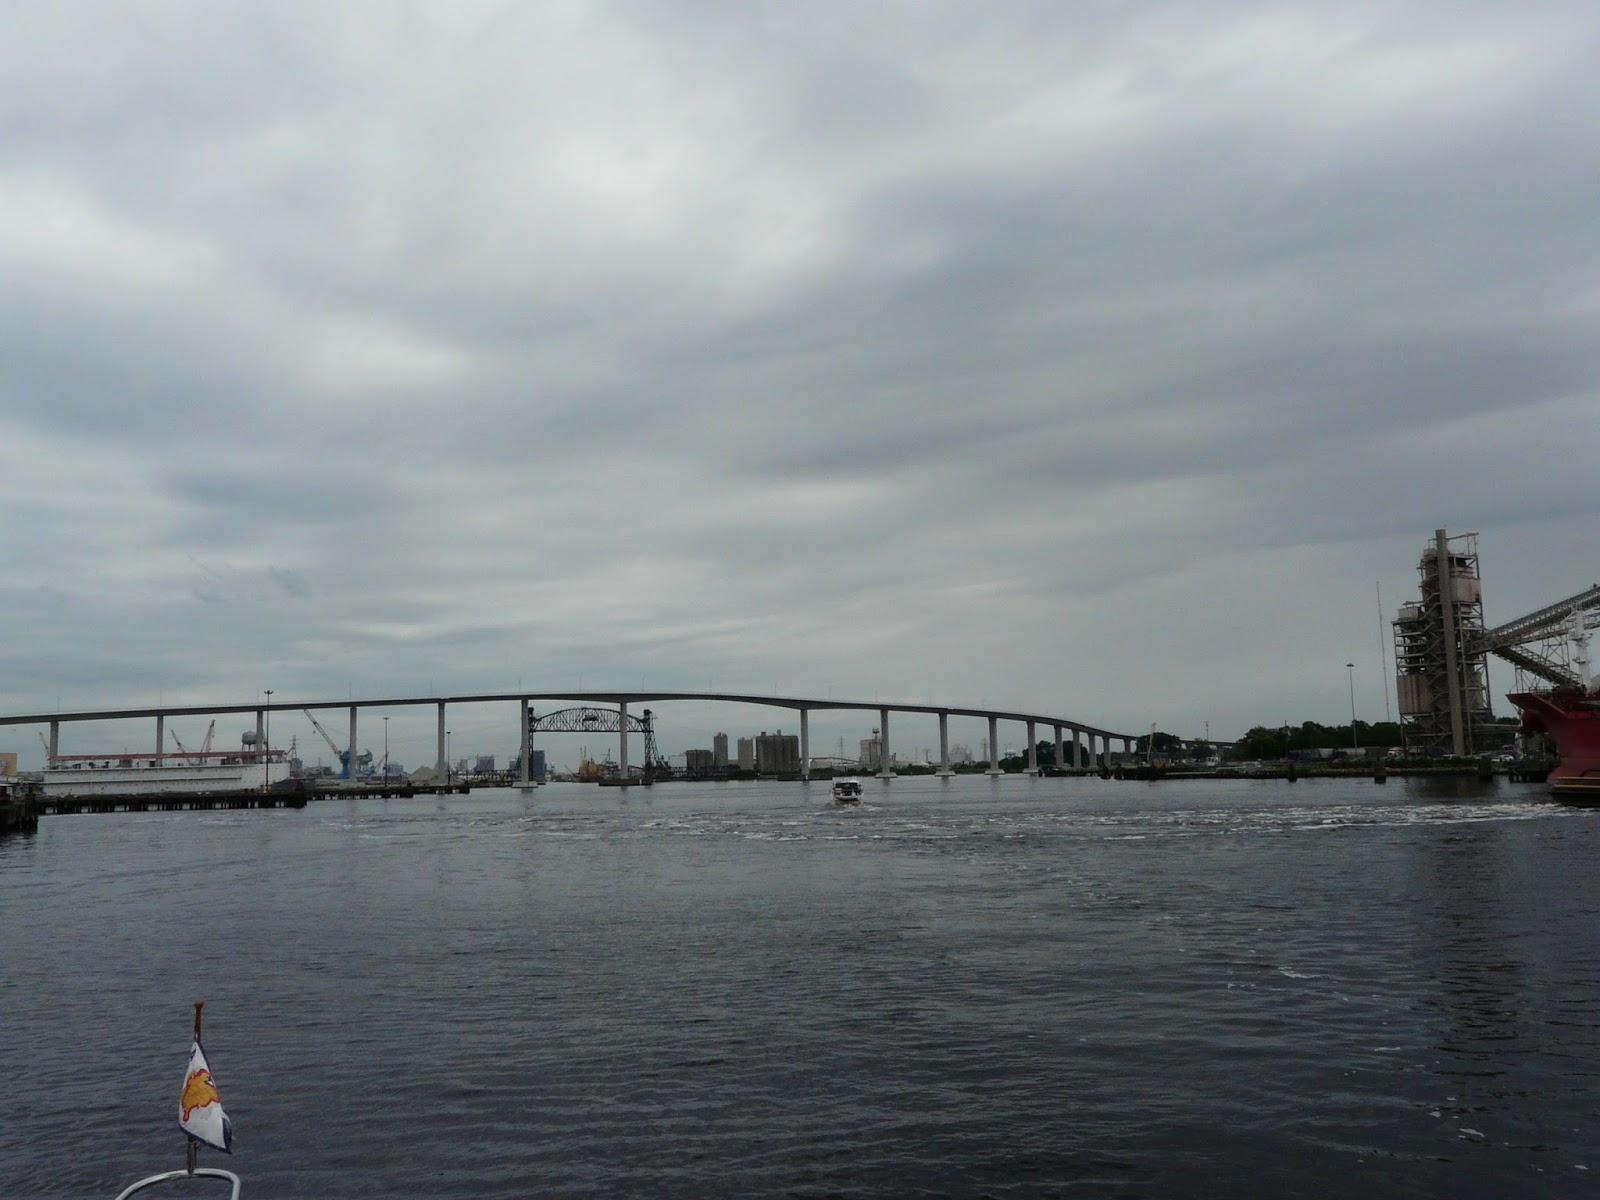 Sunny Days June In The Chesapeake